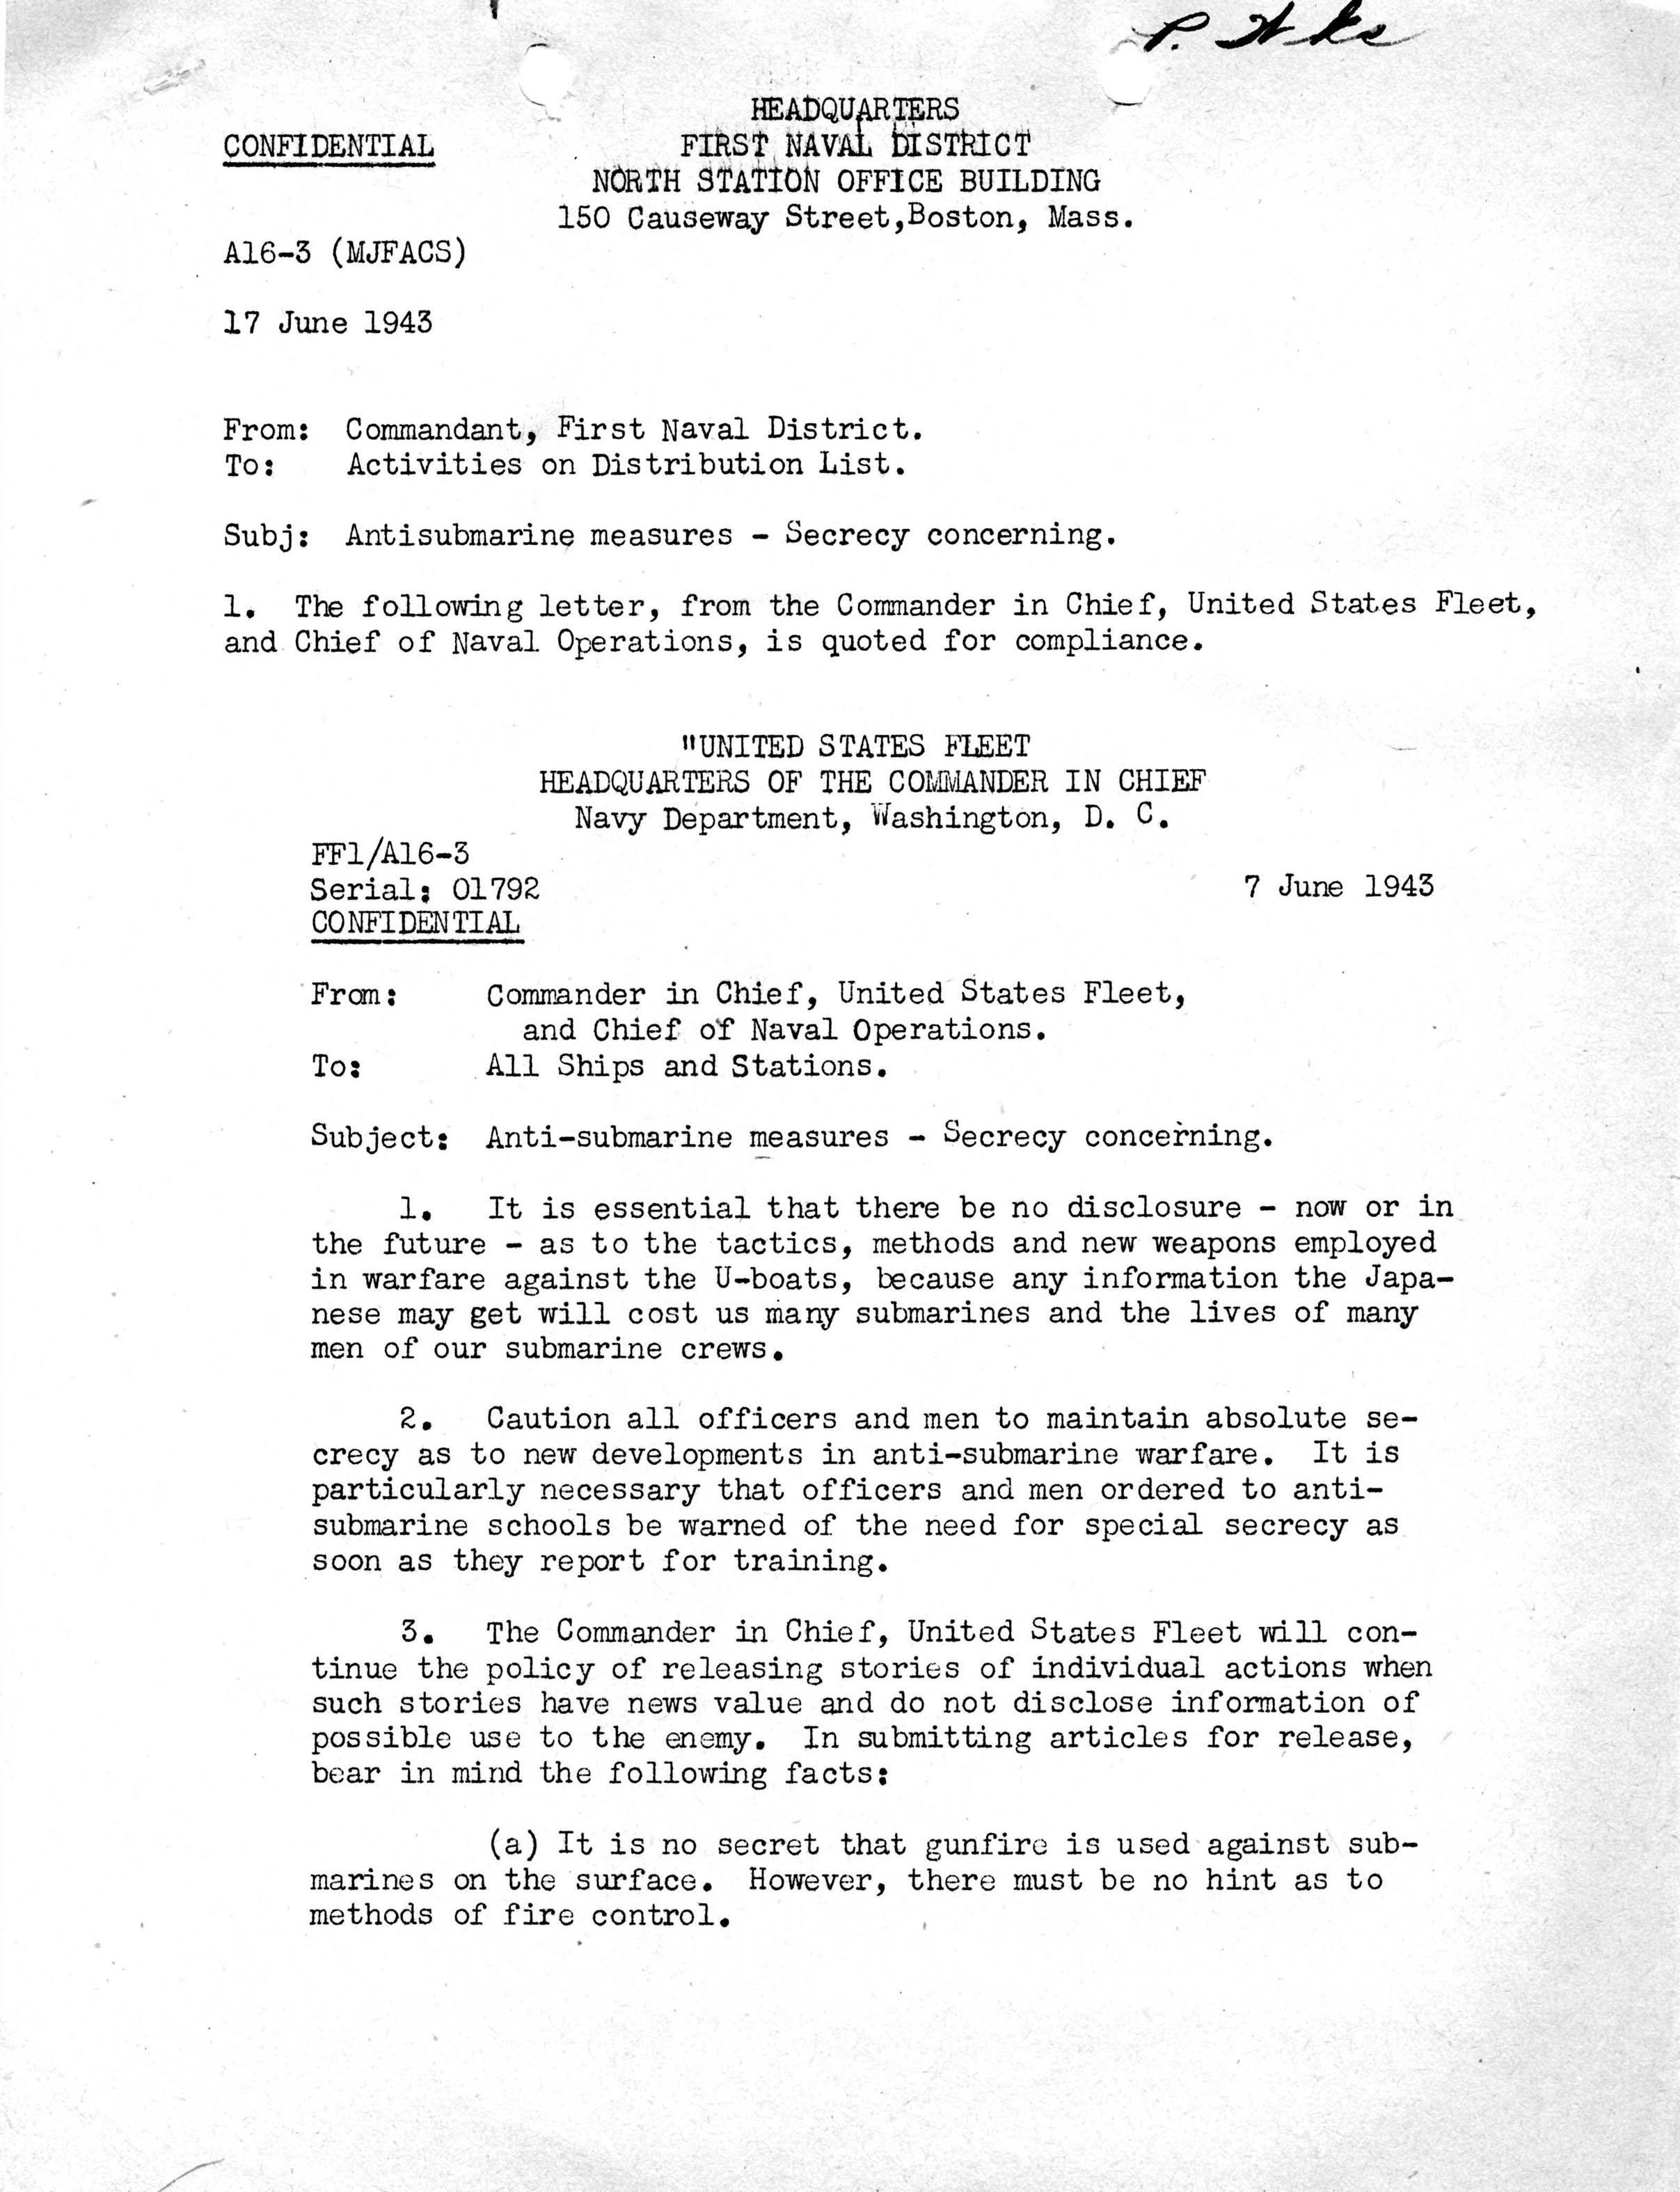 Letter Concerning Secrecy of Anti-Submarine Warfare Developments